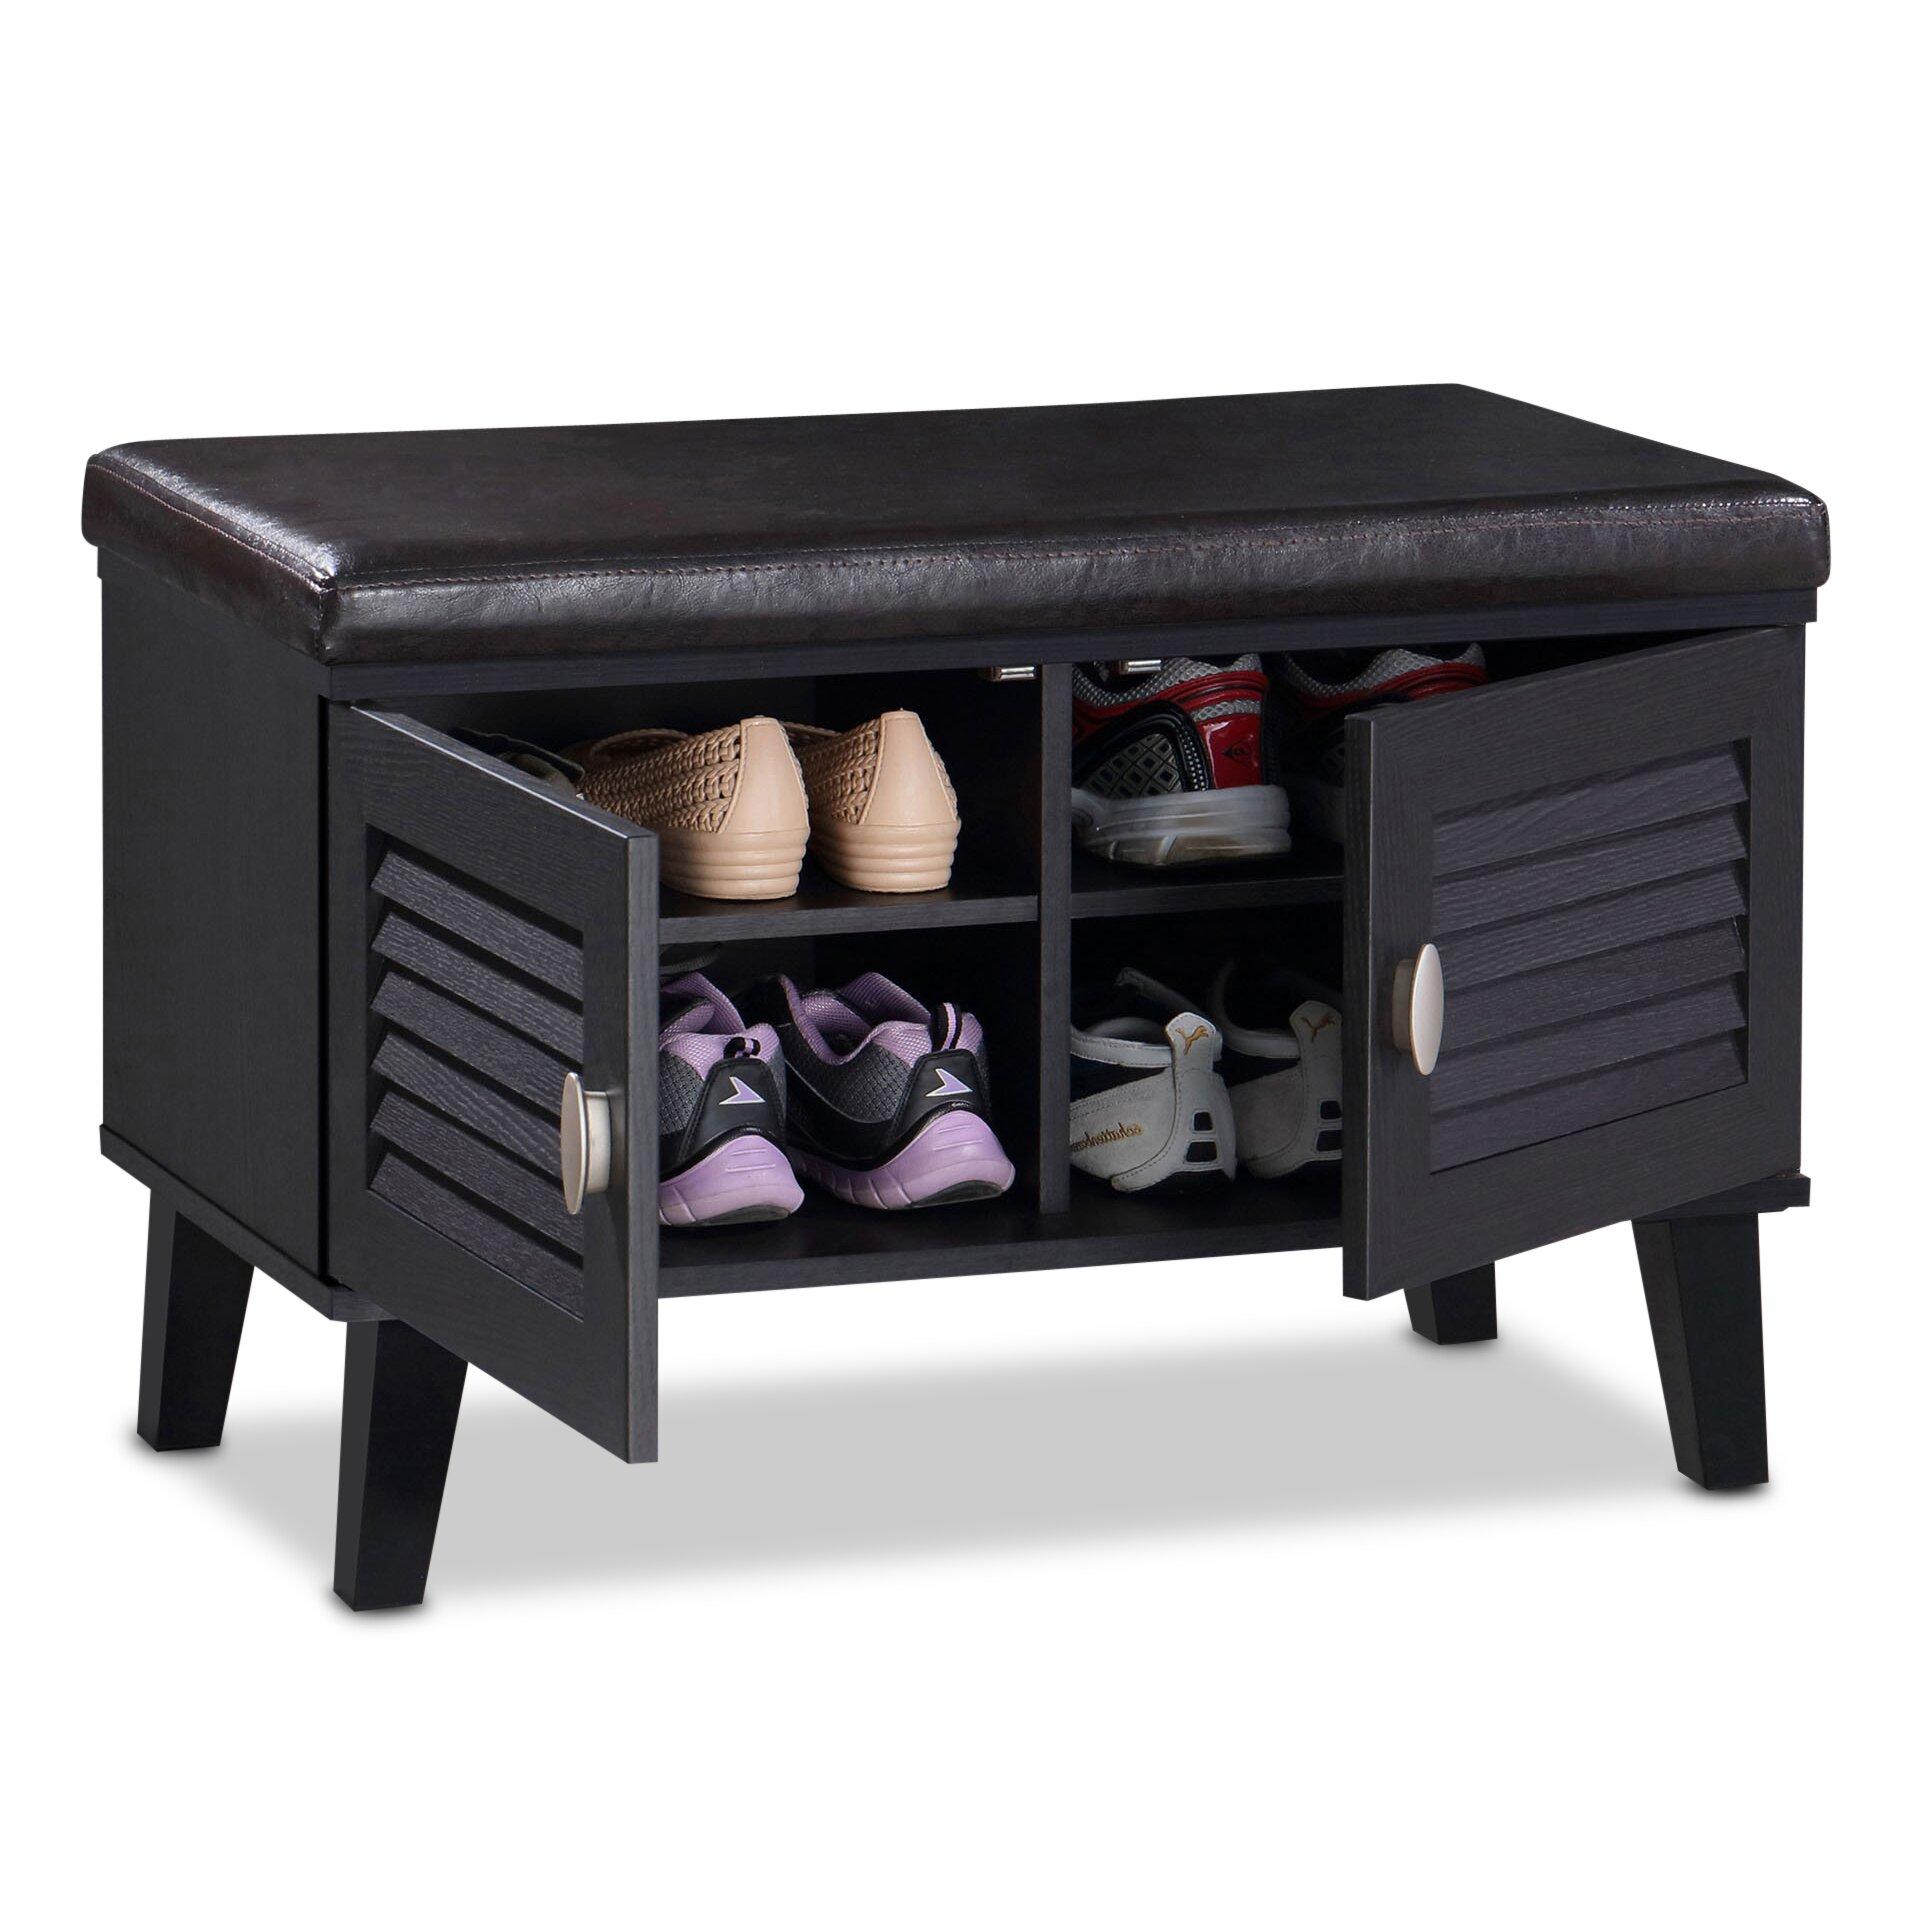 ... Wood-Entryway-Storage-Cushioned-Bench-Shoe-Rack-Cabinet-Organizer.jpg